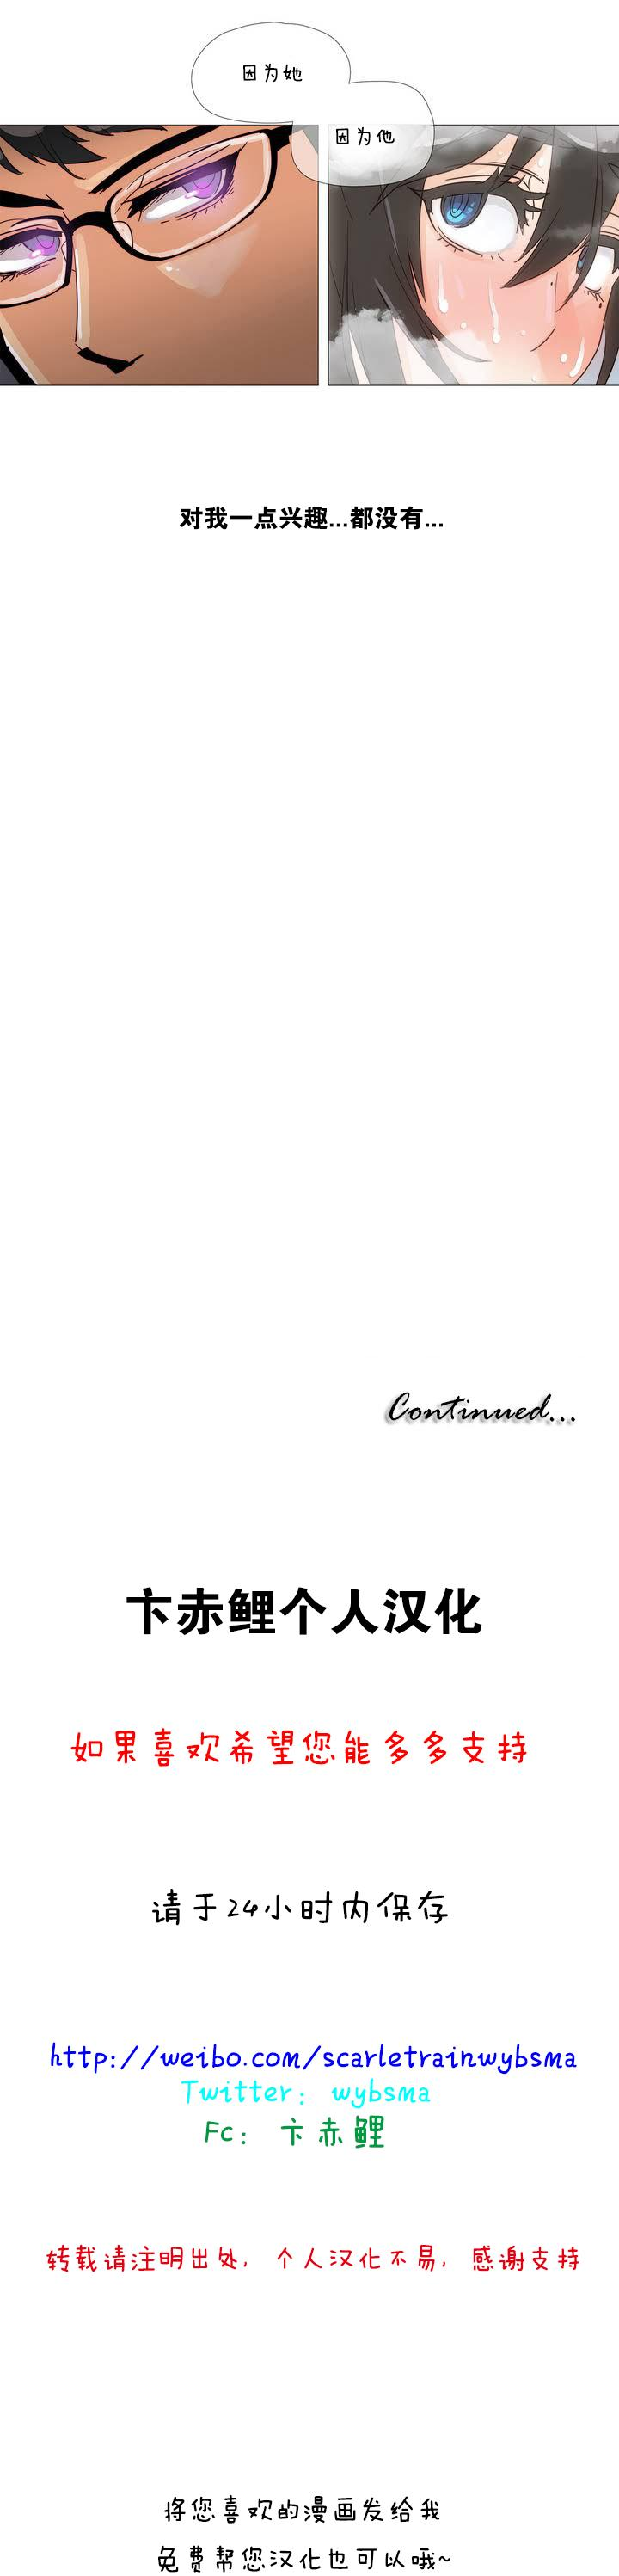 HouseHold Affairs 【卞赤鲤个人汉化】1~21话(持续更新中) 16